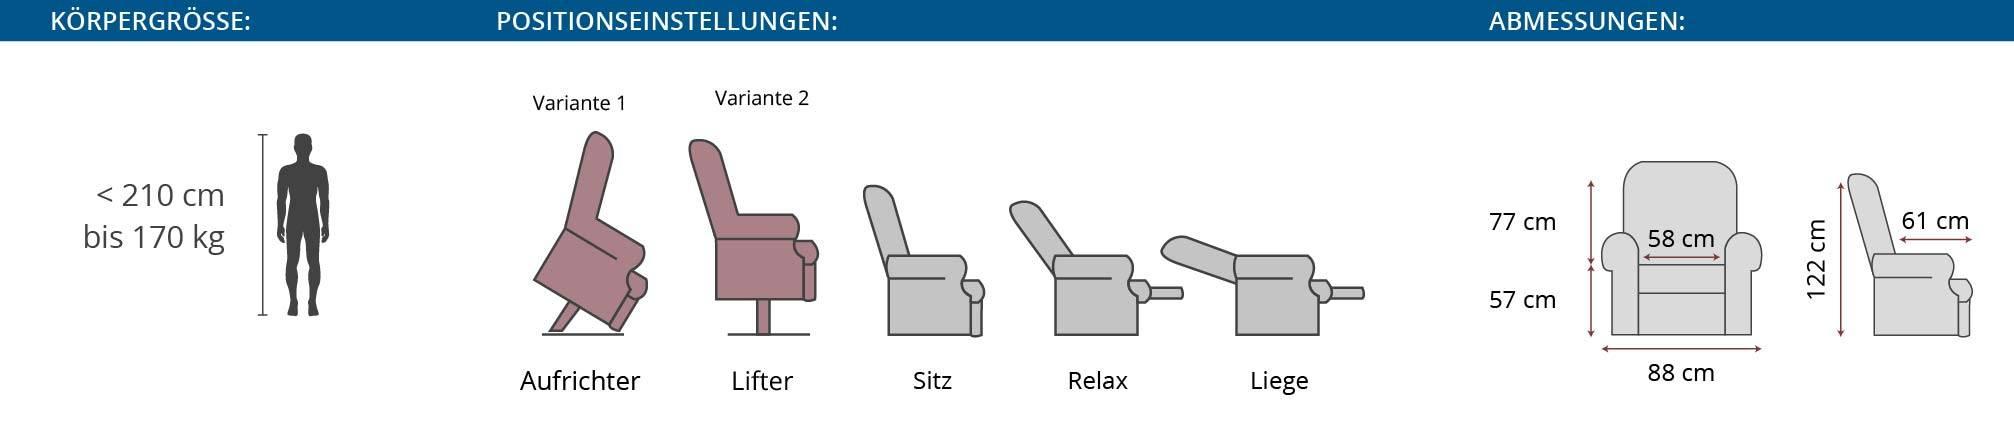 Spez-Komfort-f-per-m-UEbergroesse_1motorig